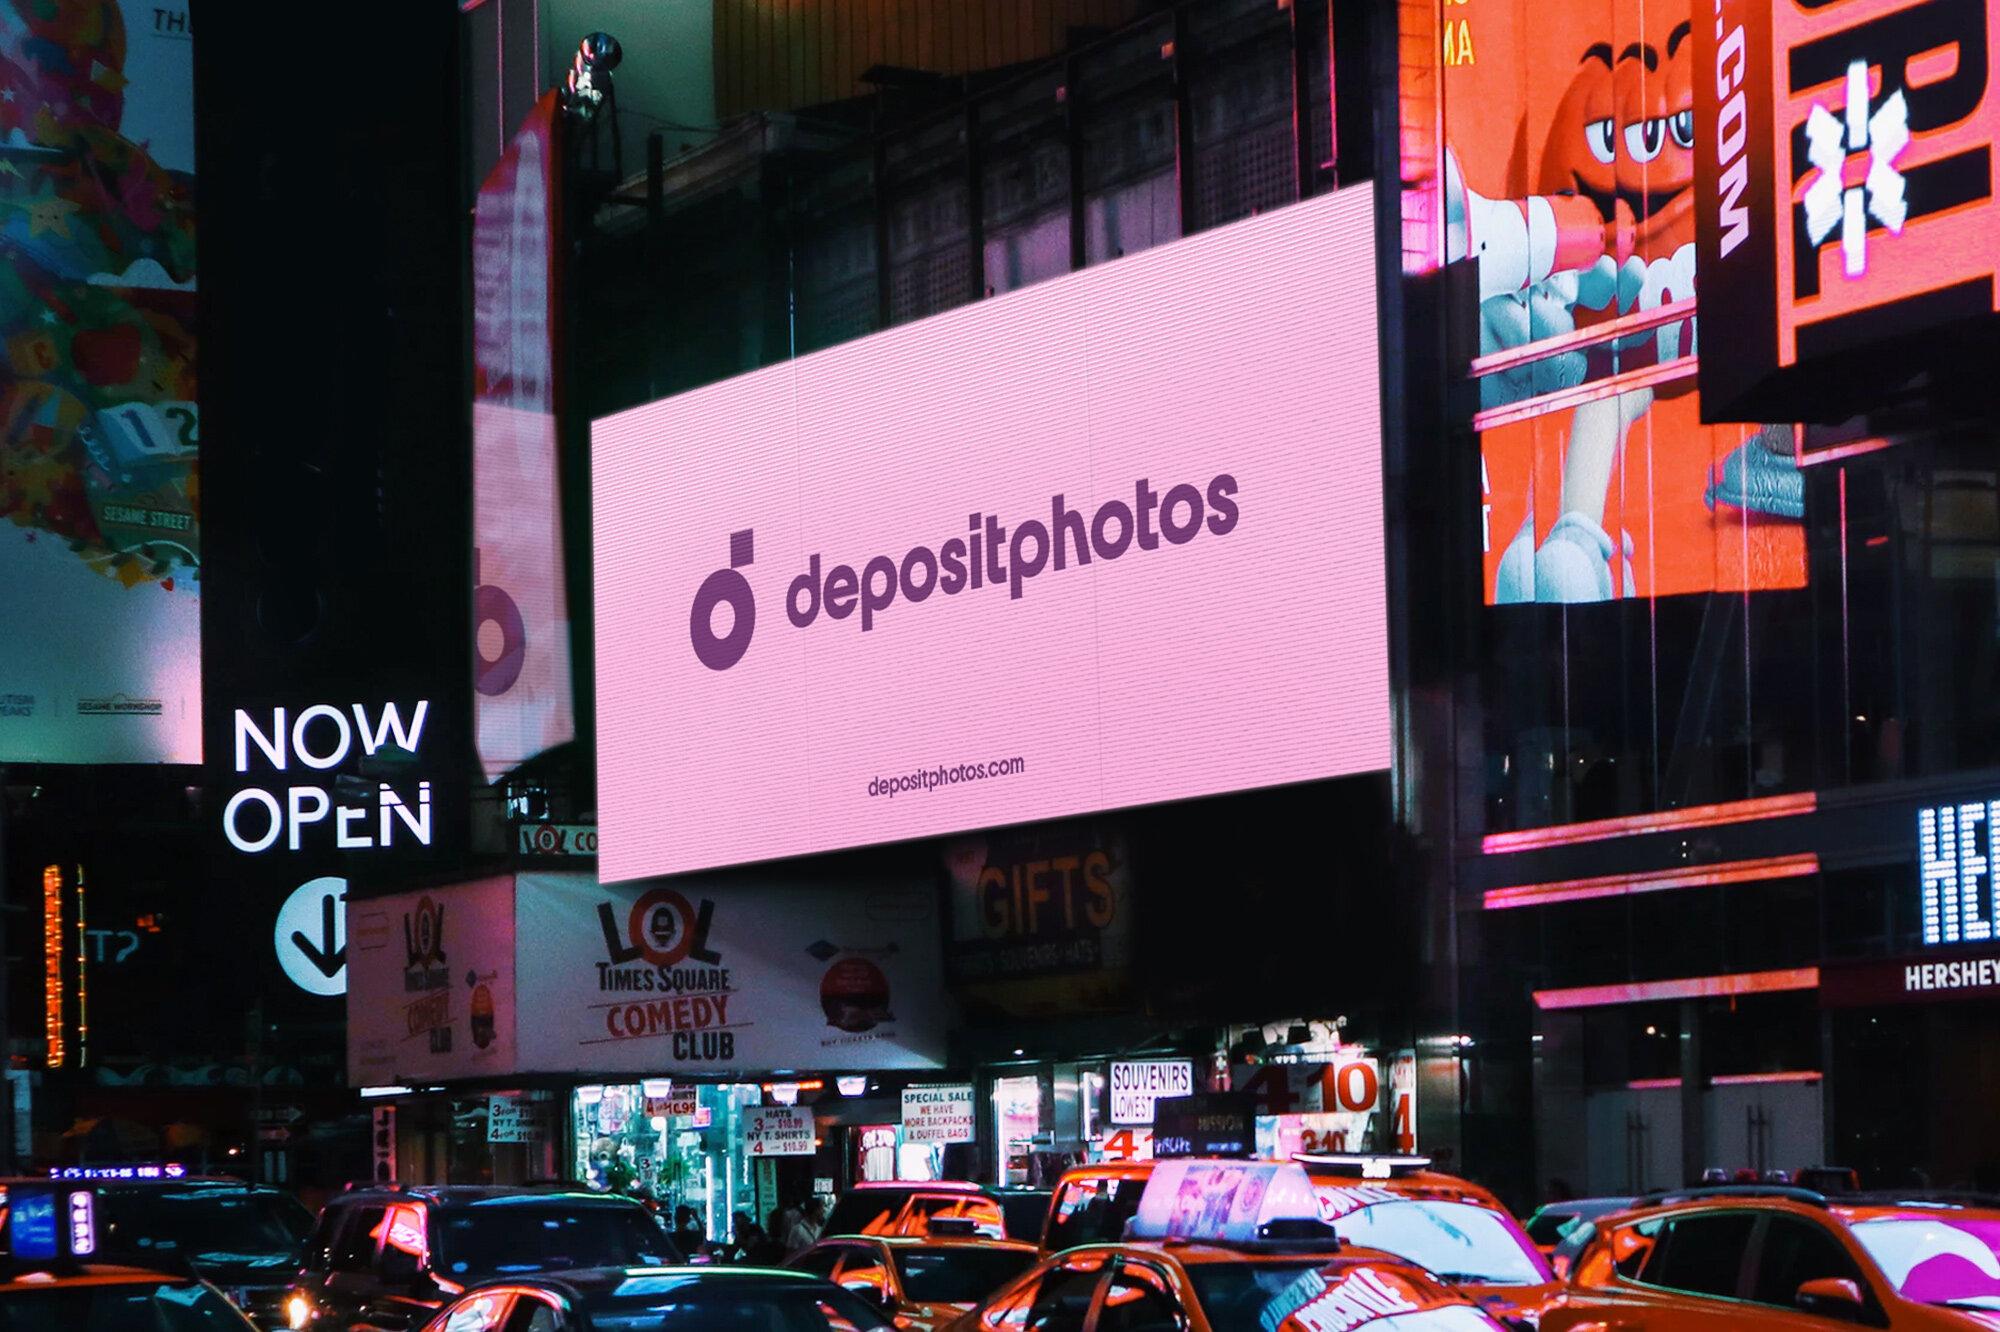 Depositphotos redesign new logo 2021